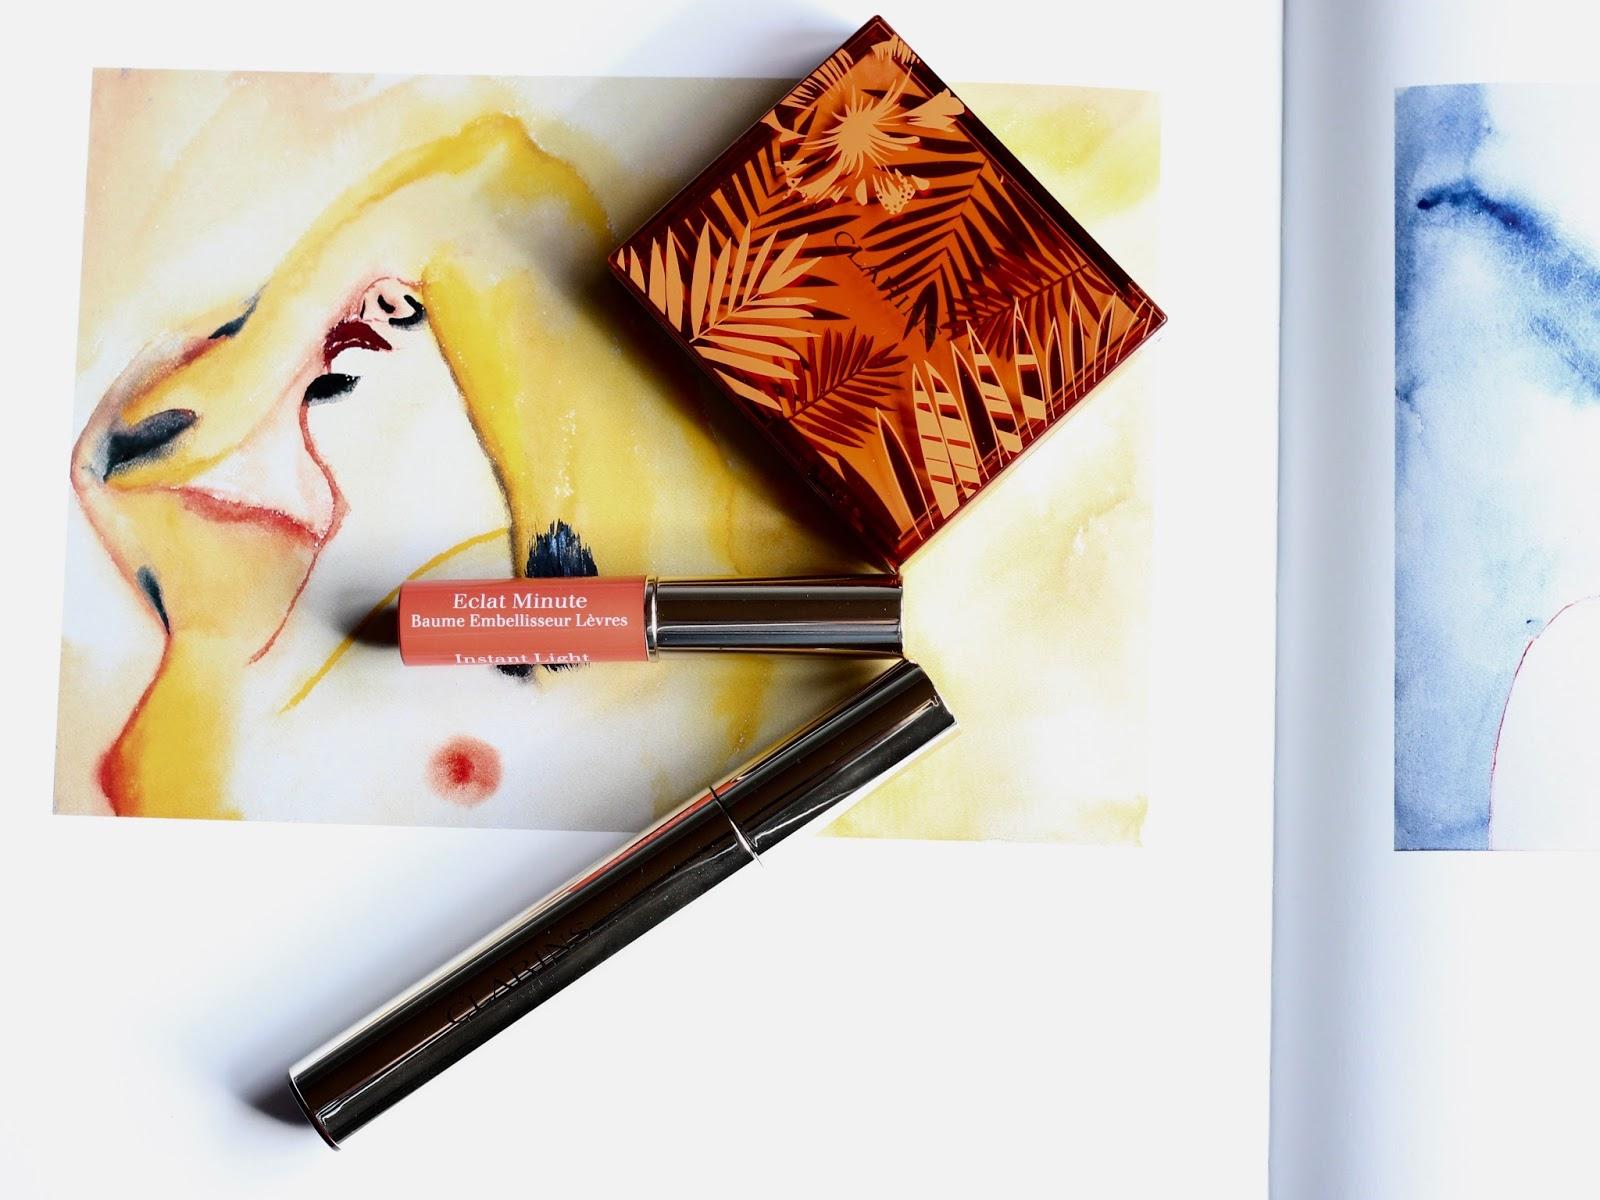 Clarins Sommerlook 2017 Limitierte MakeUp Kollektion